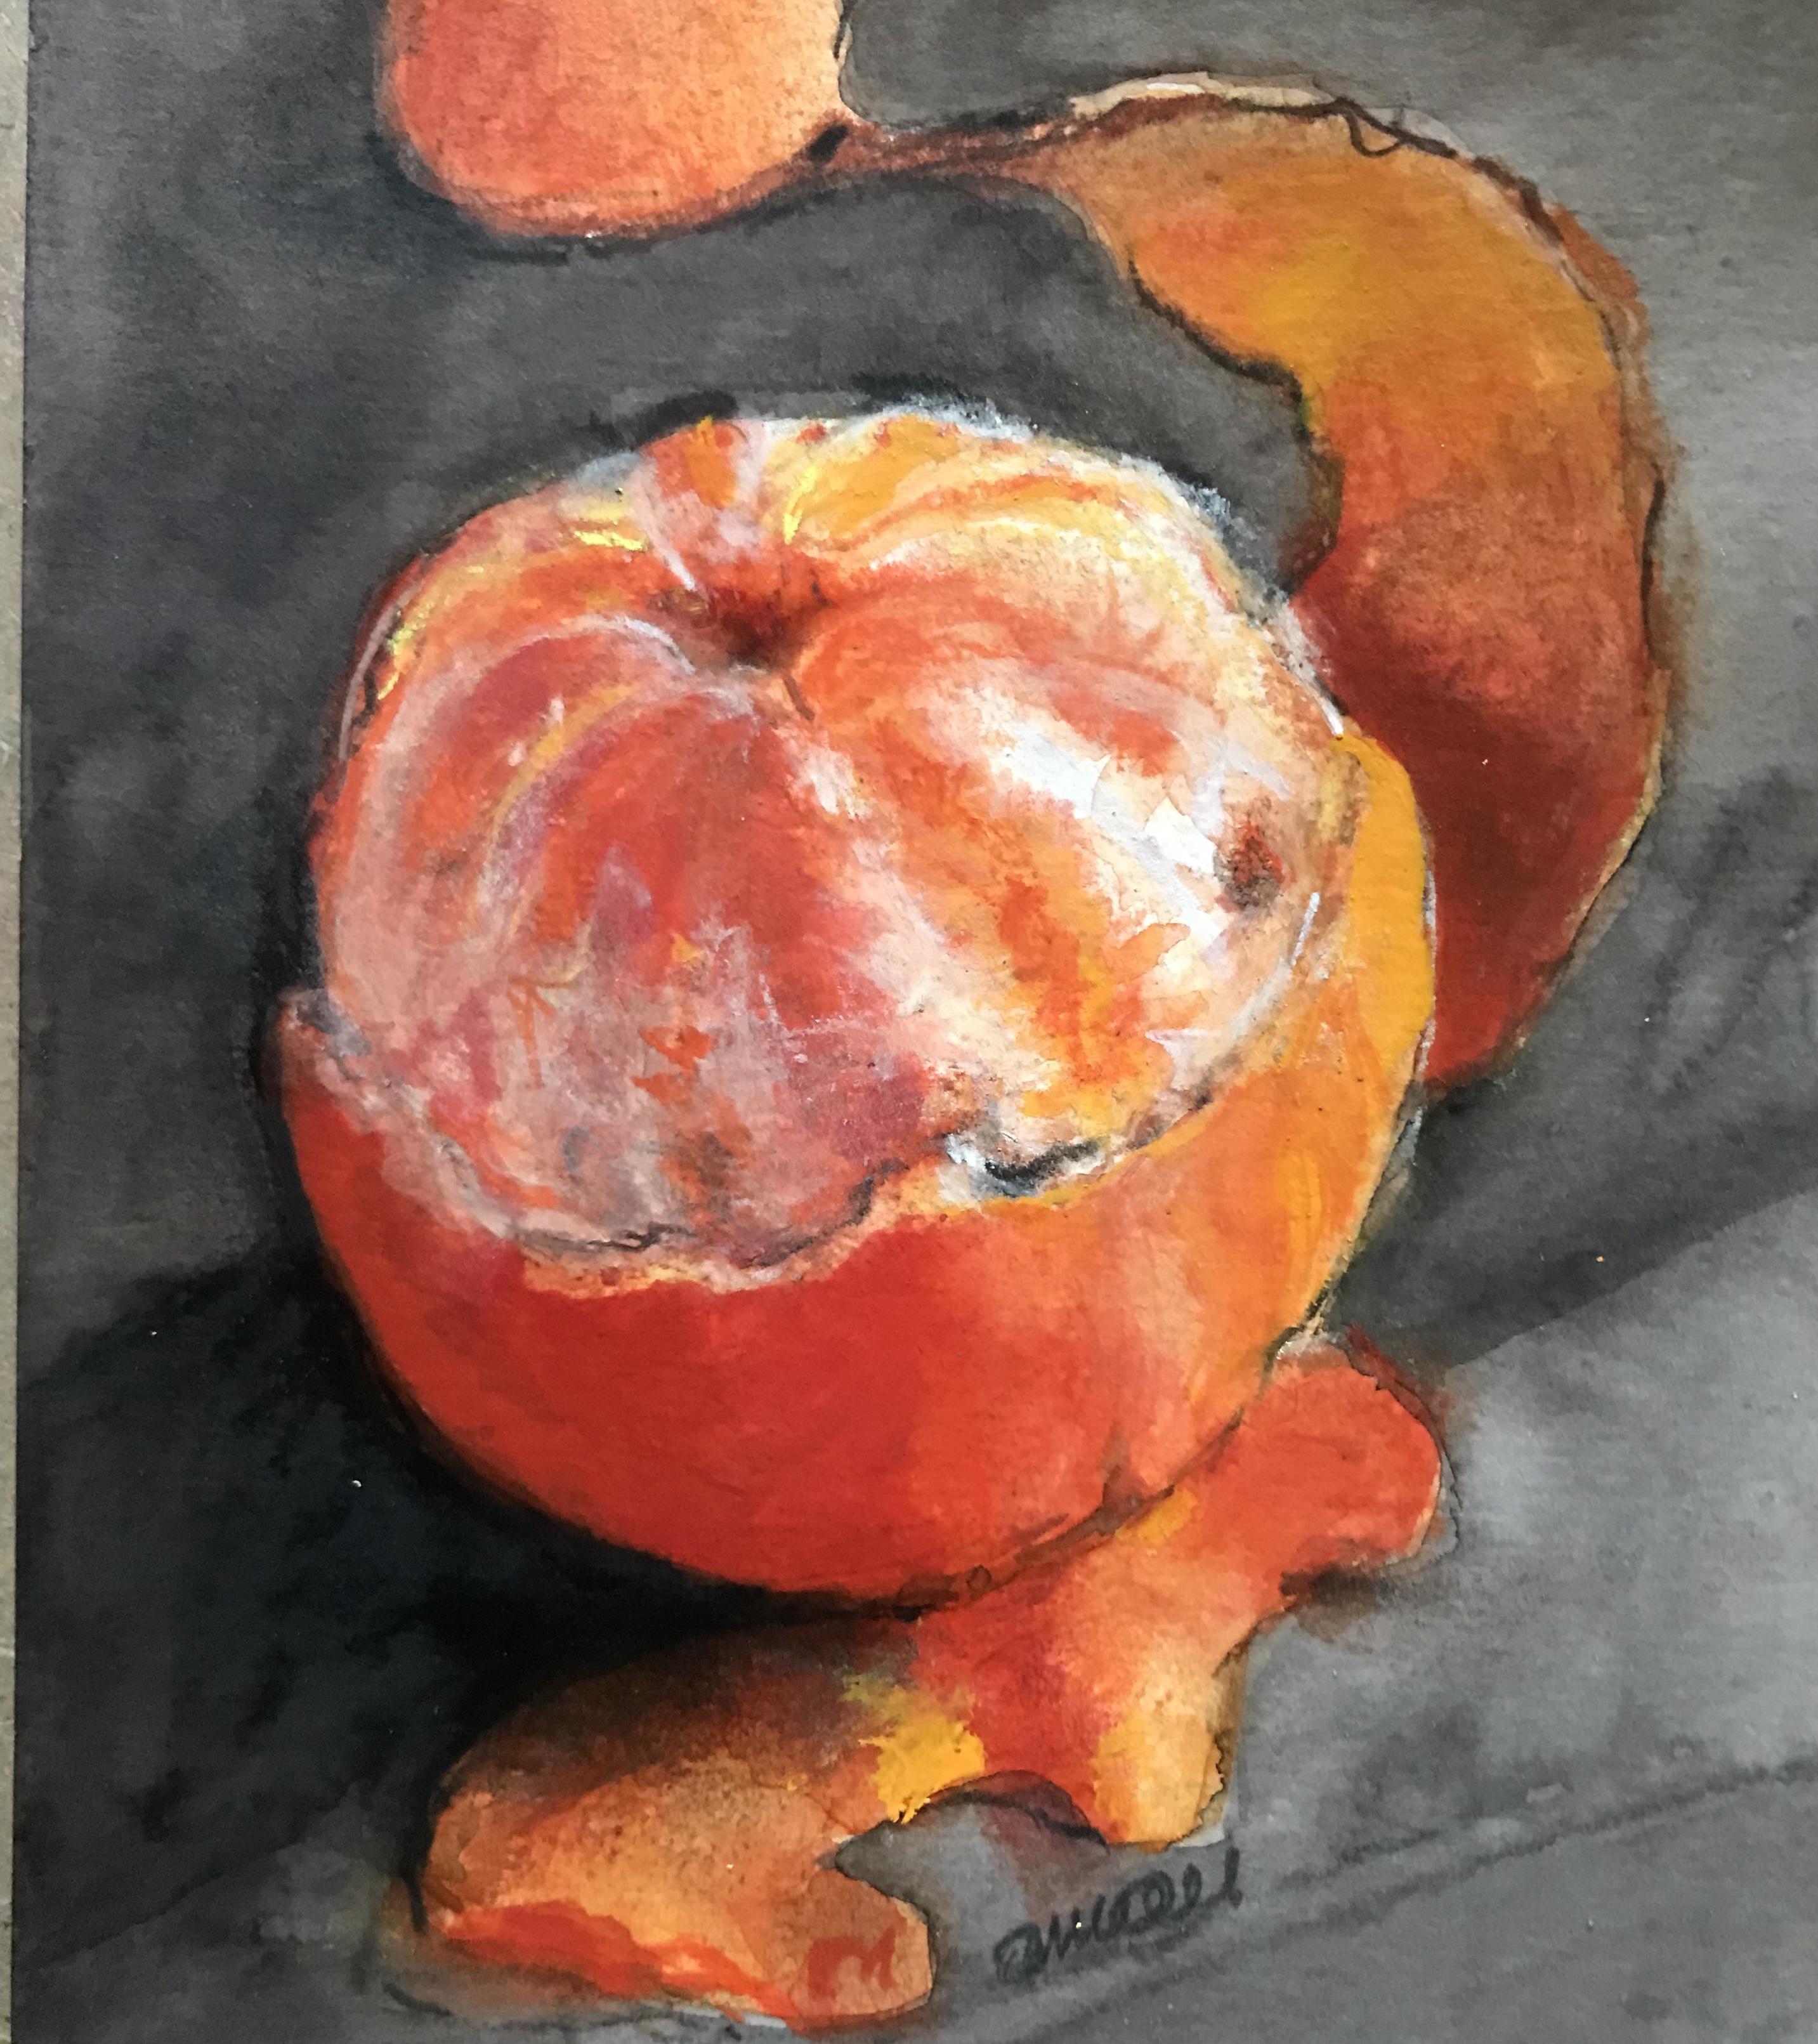 252-mandarijntje/mixed m 14x17cm